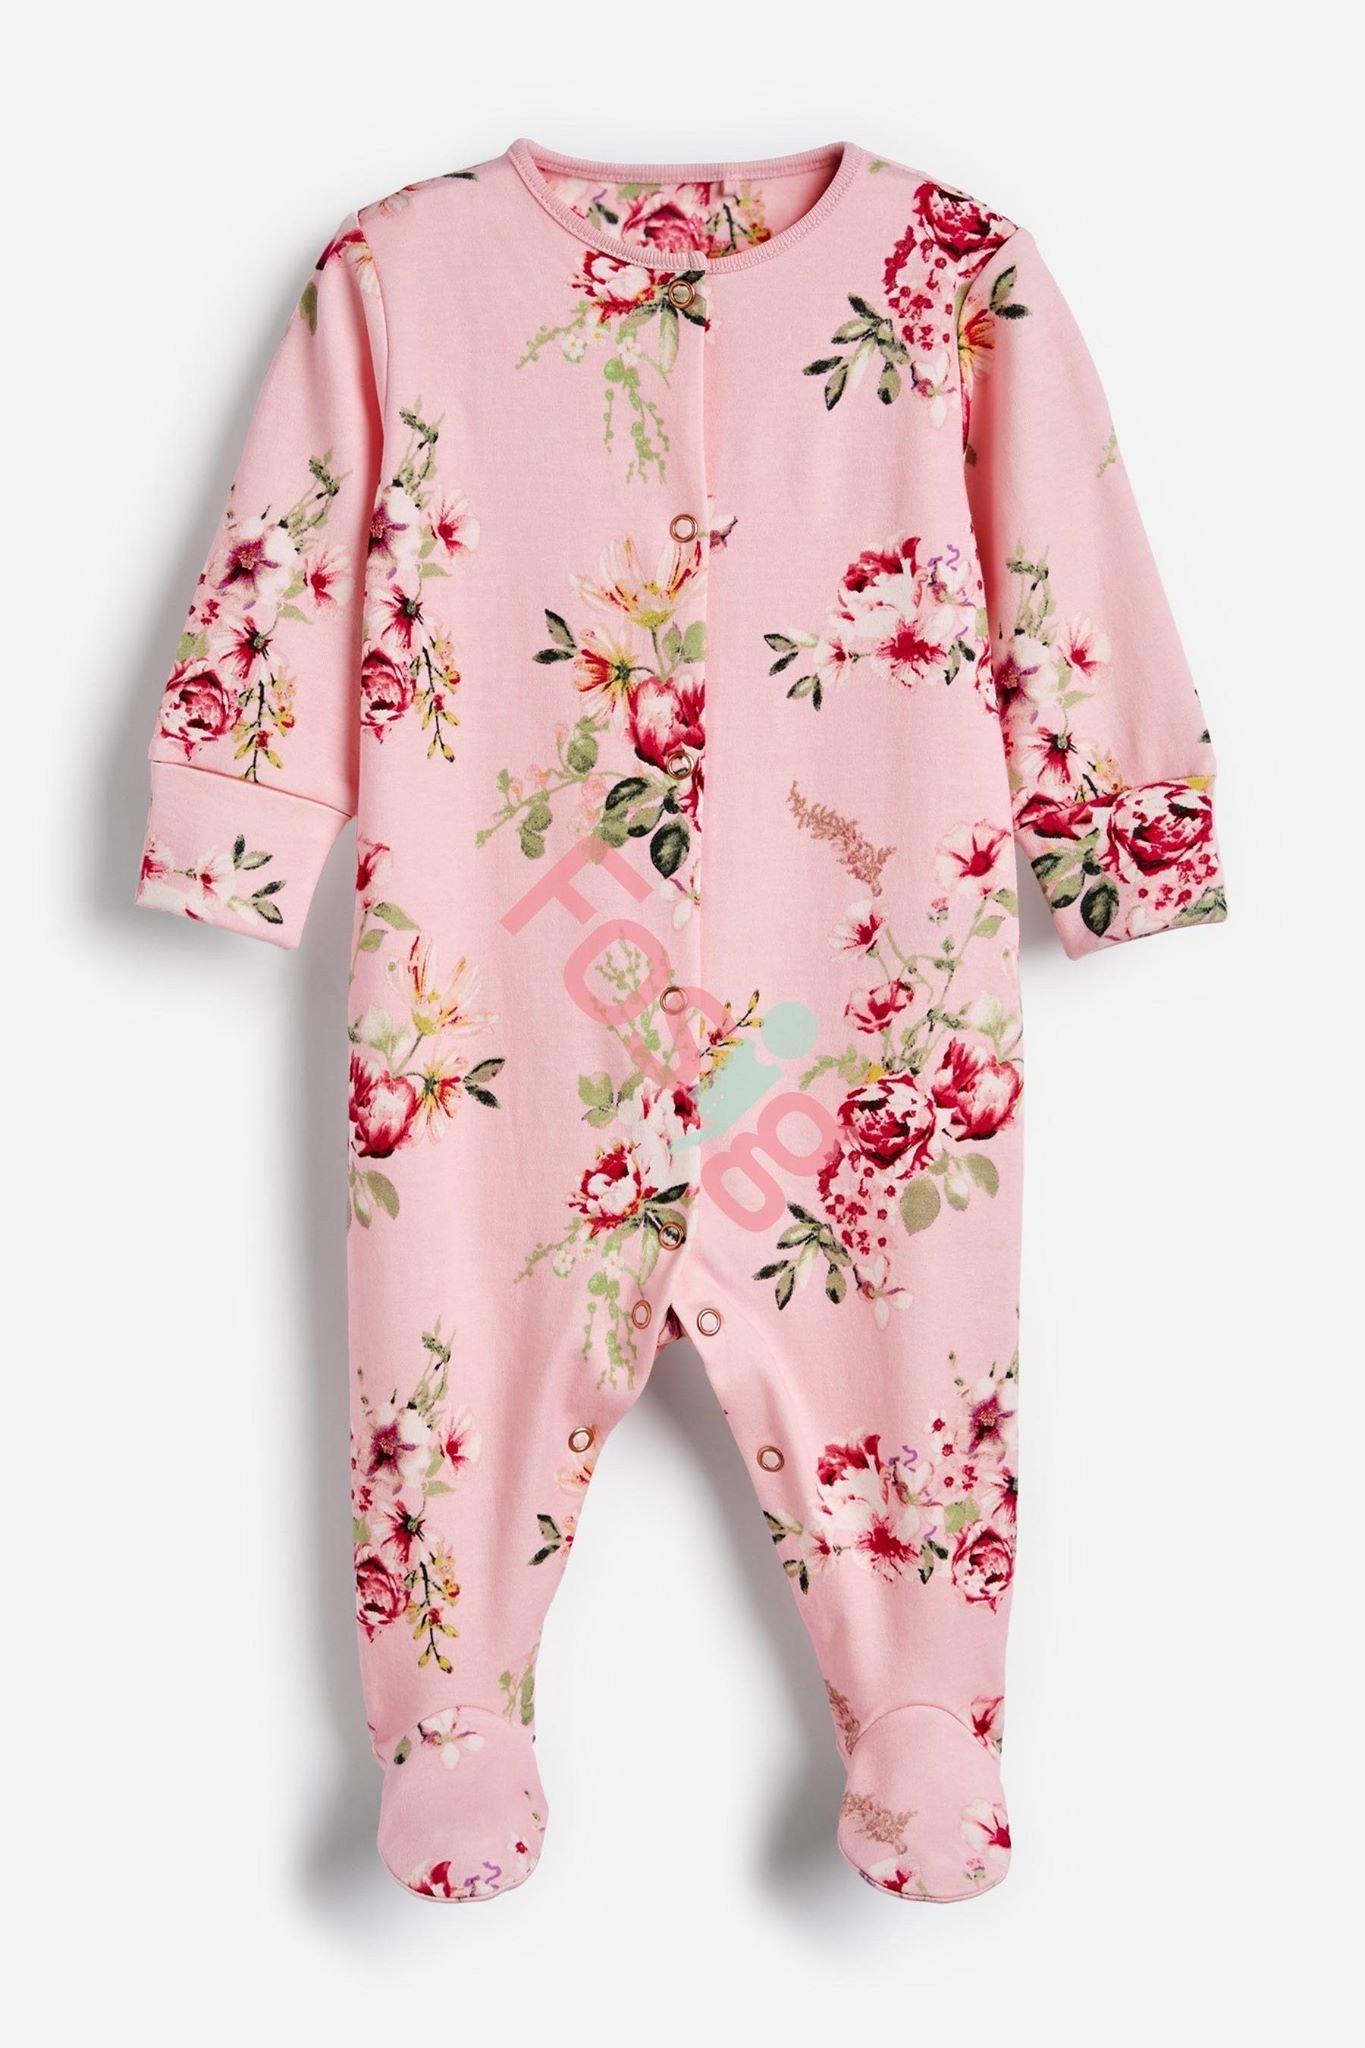 [3-10kg] Sleepsuit Next Baby 73 [Girl] - Hồng Nhạt/Hoa